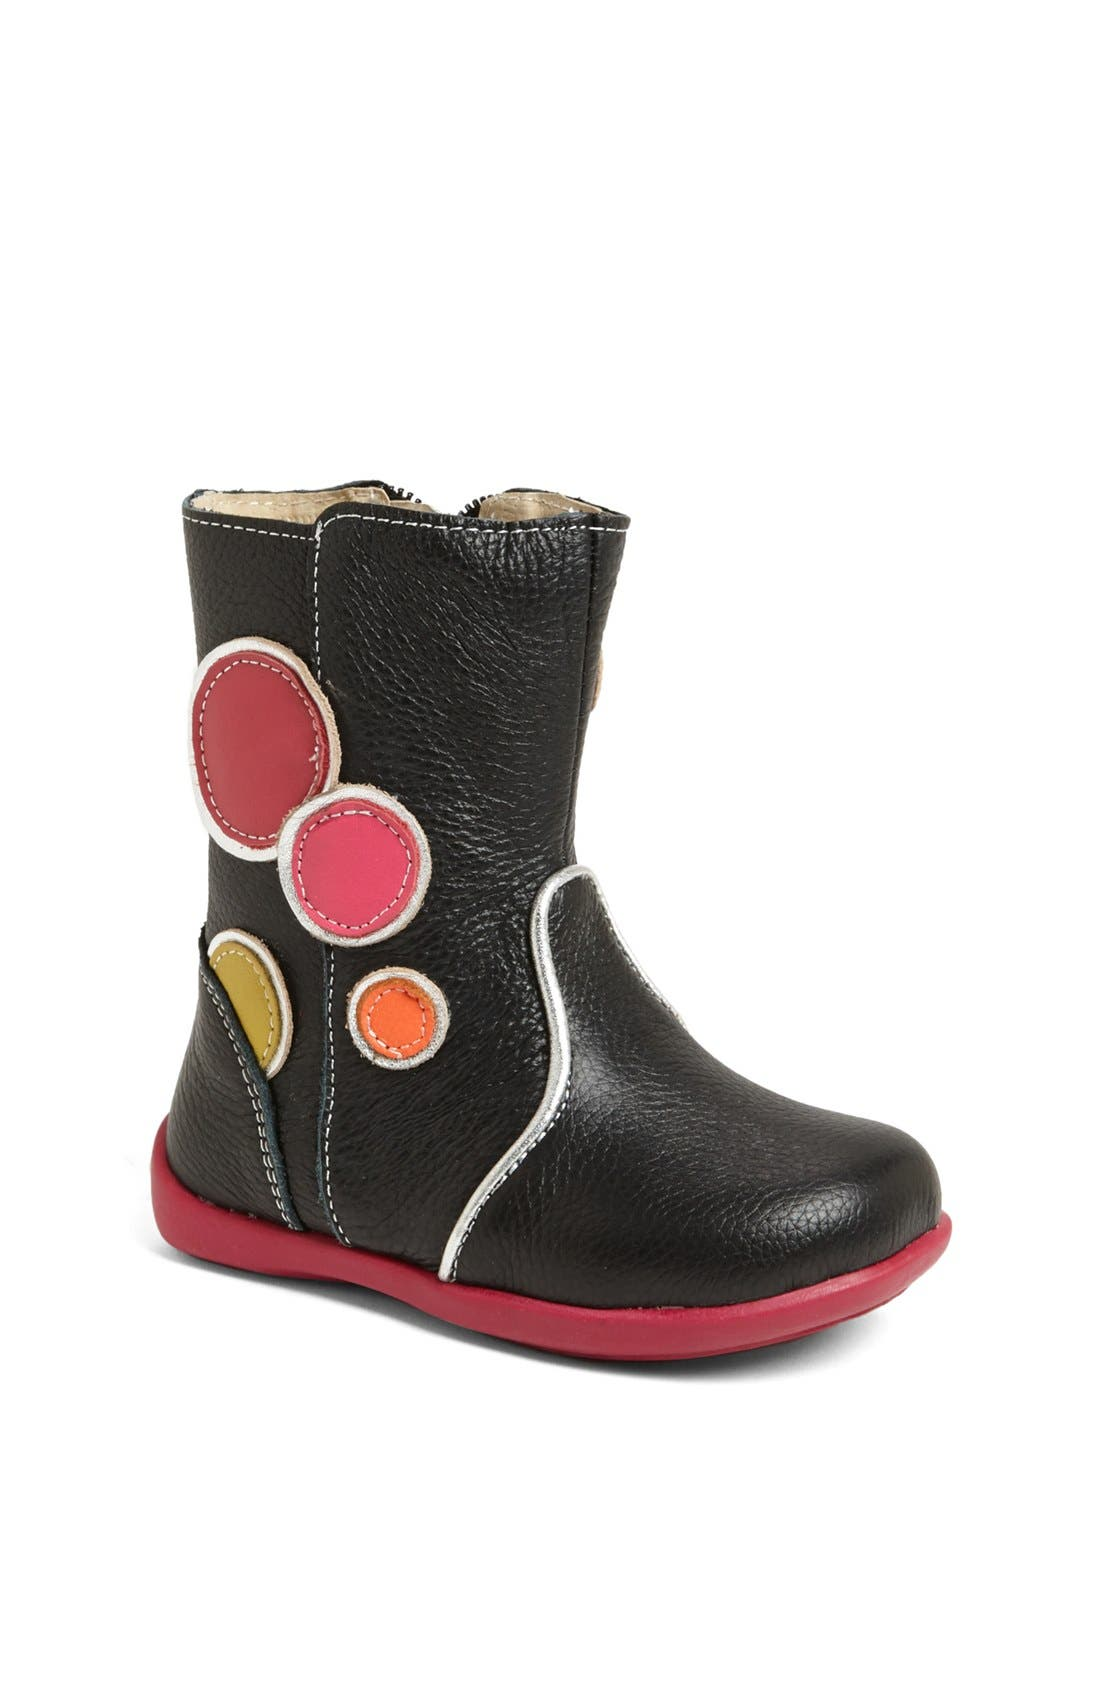 Main Image - See Kai Run 'Lena' Boot (Toddler & Little Kid)